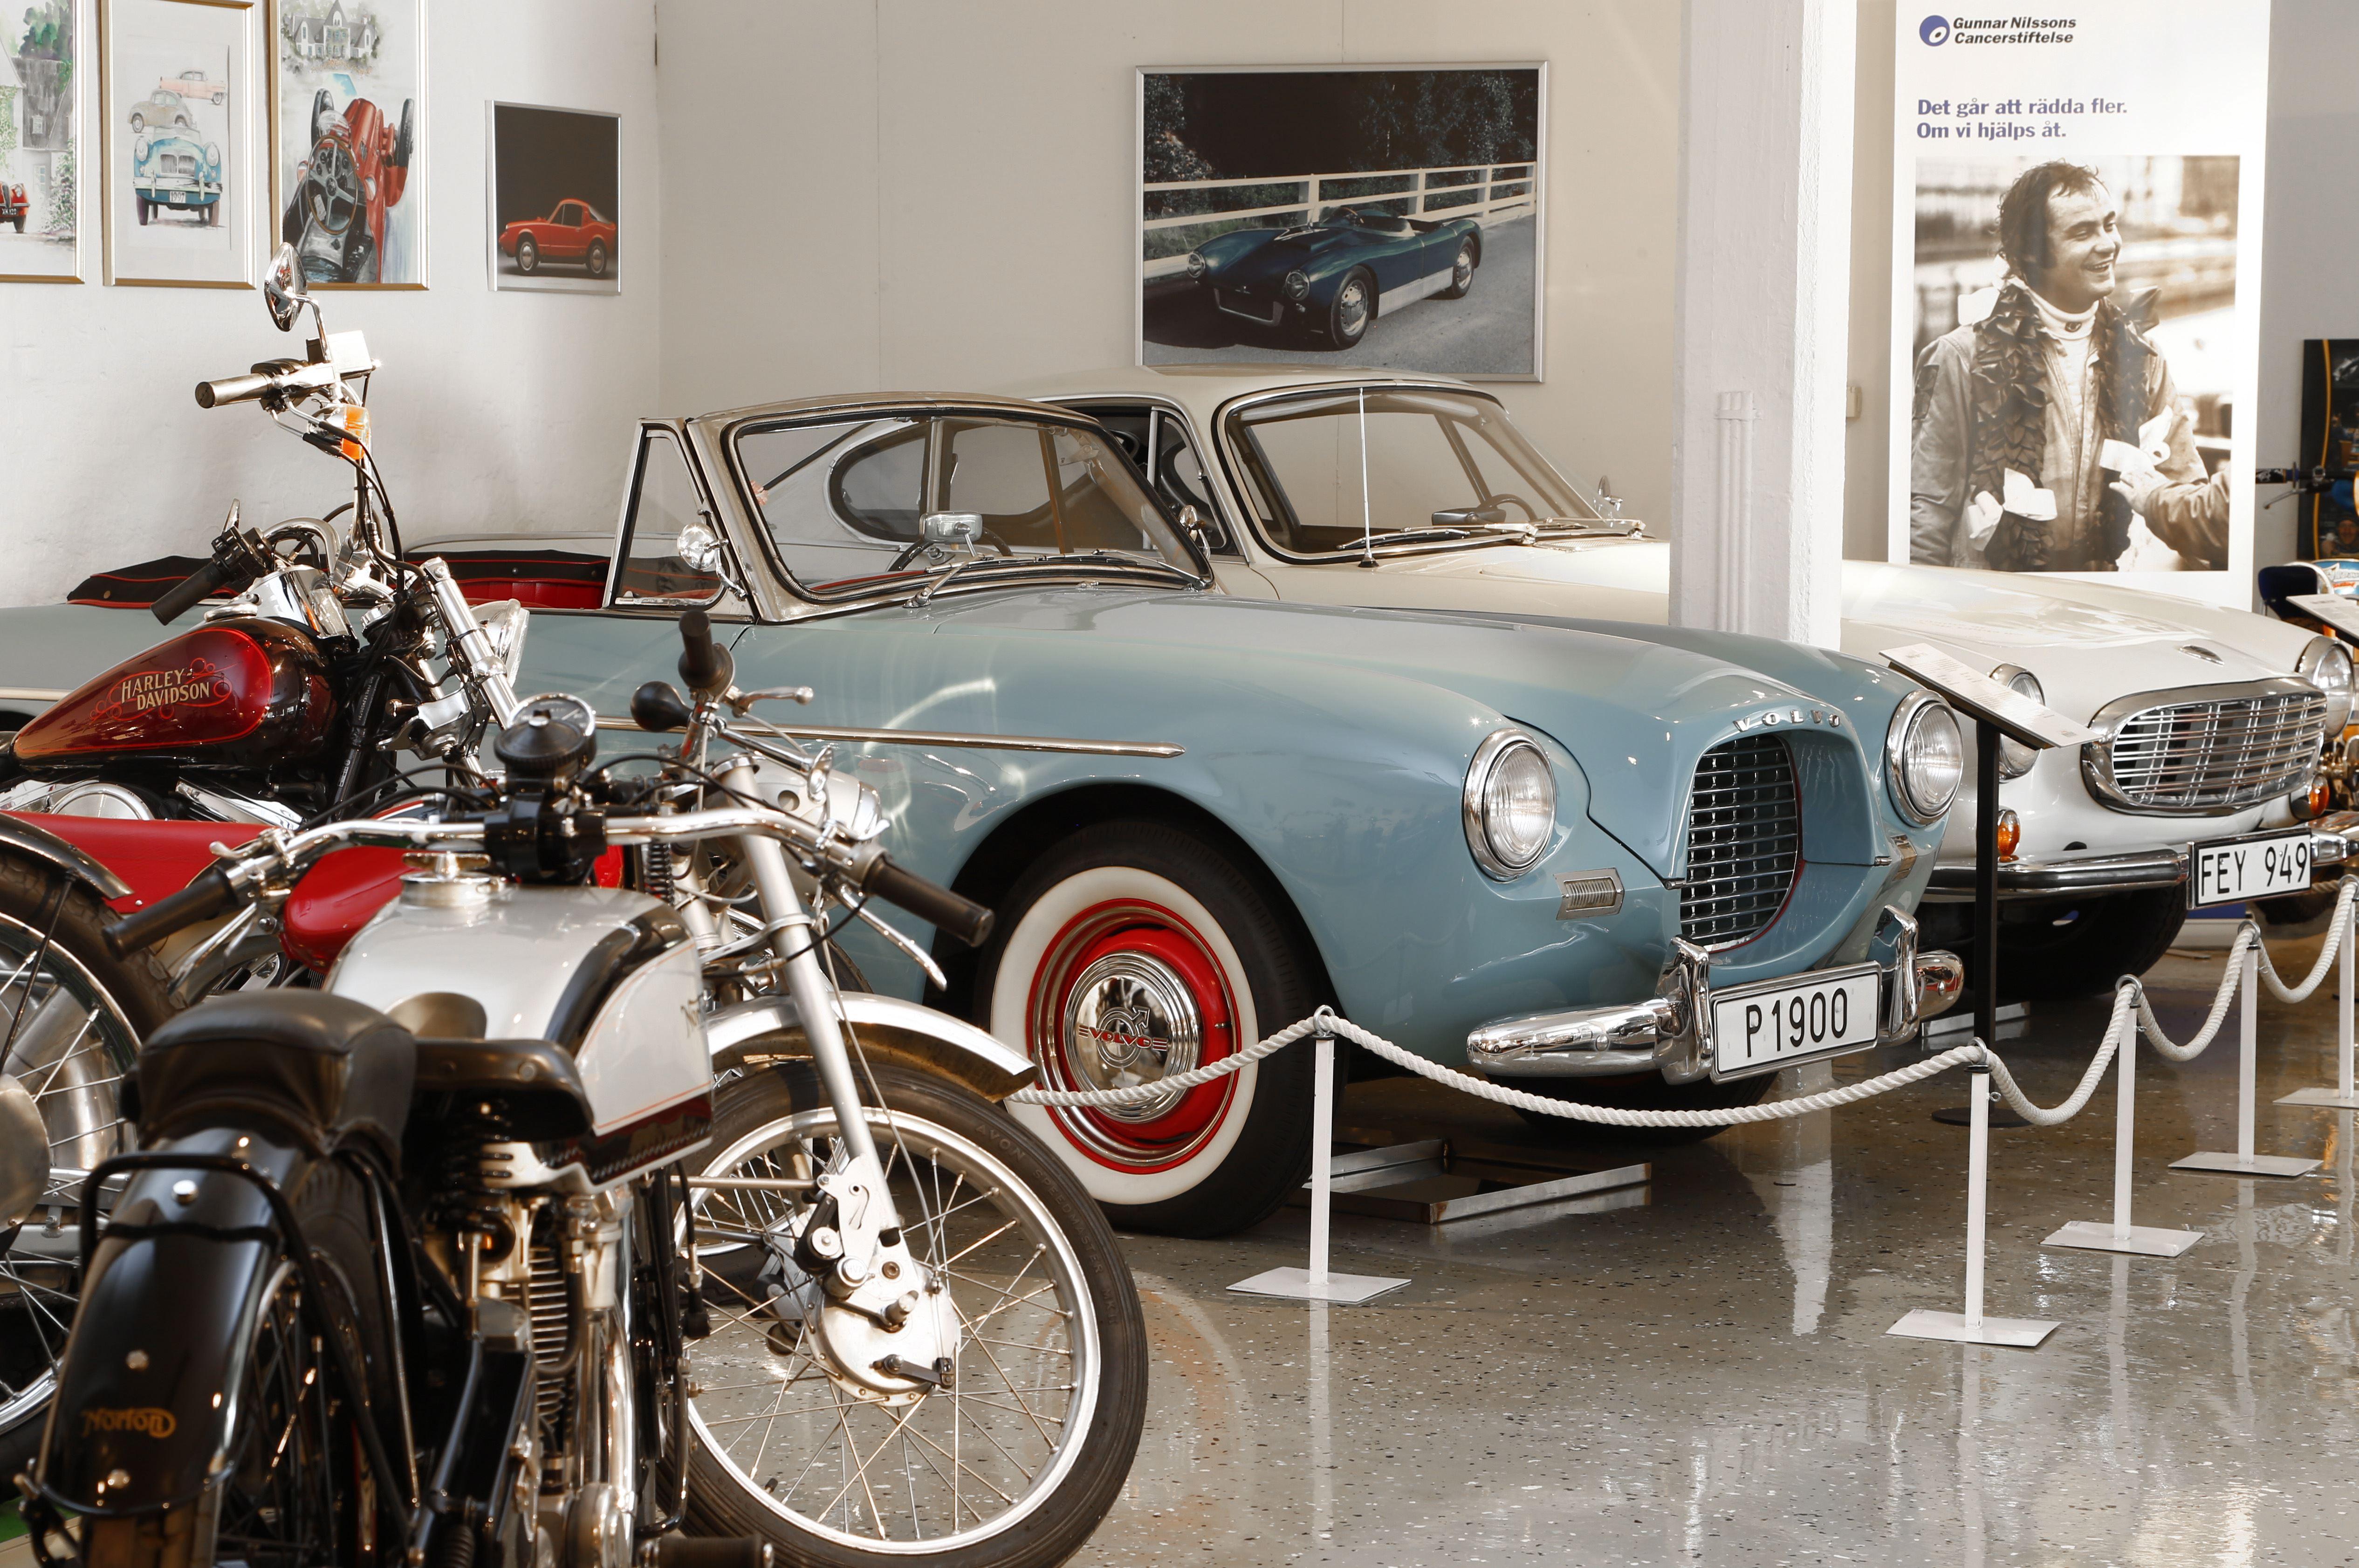 Automuseum - Albinsson & Sjöberg